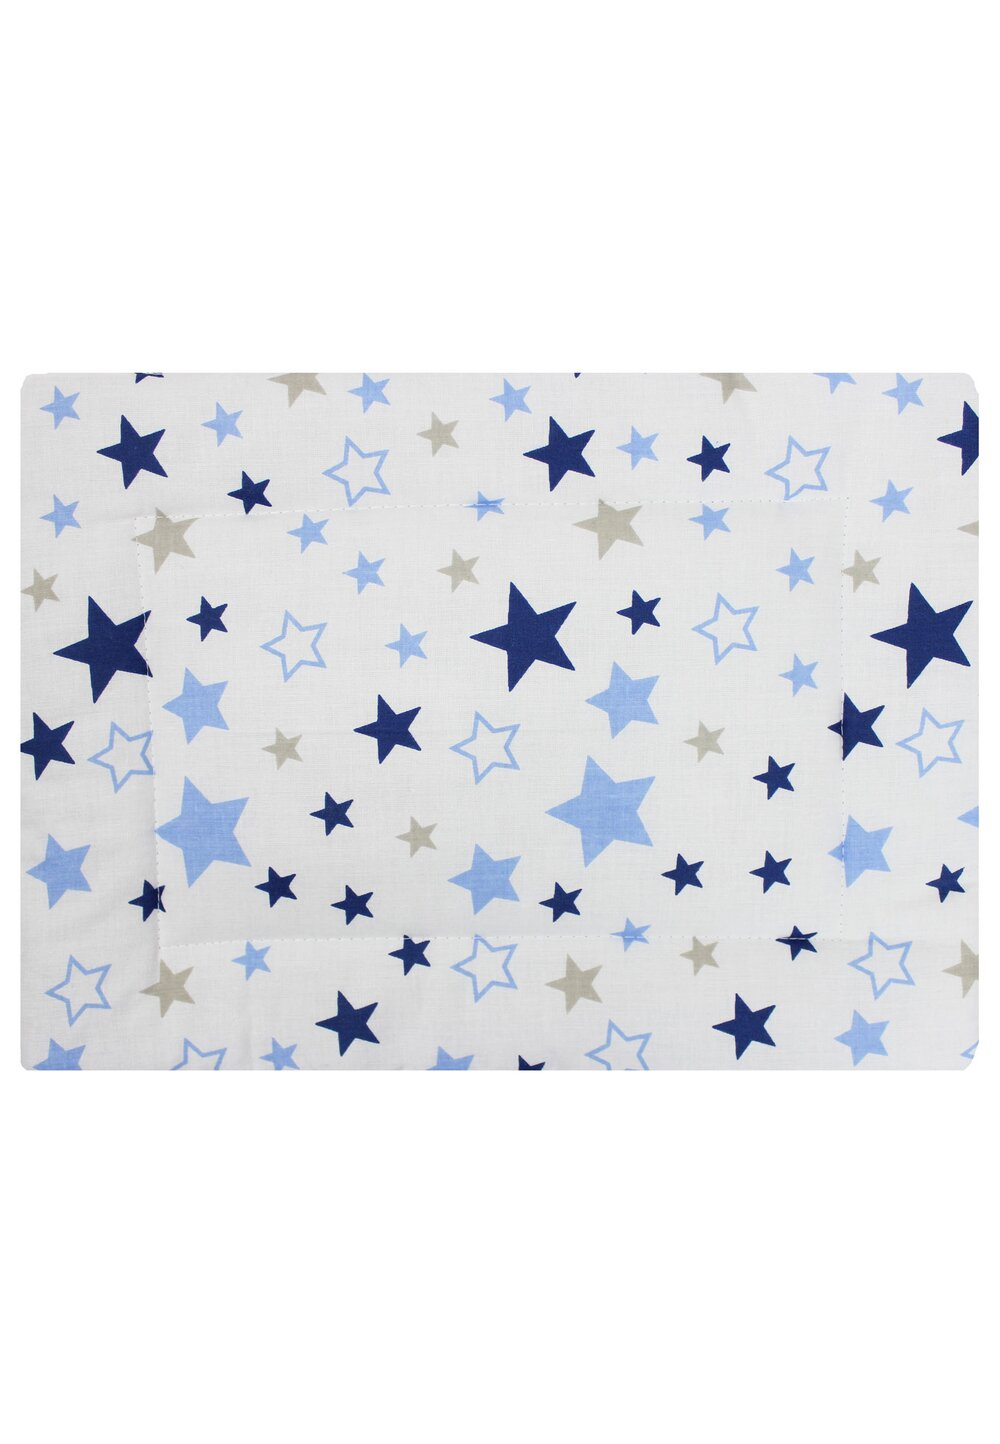 Perna slim, alba cu stelute albastre, 37x28cm imagine